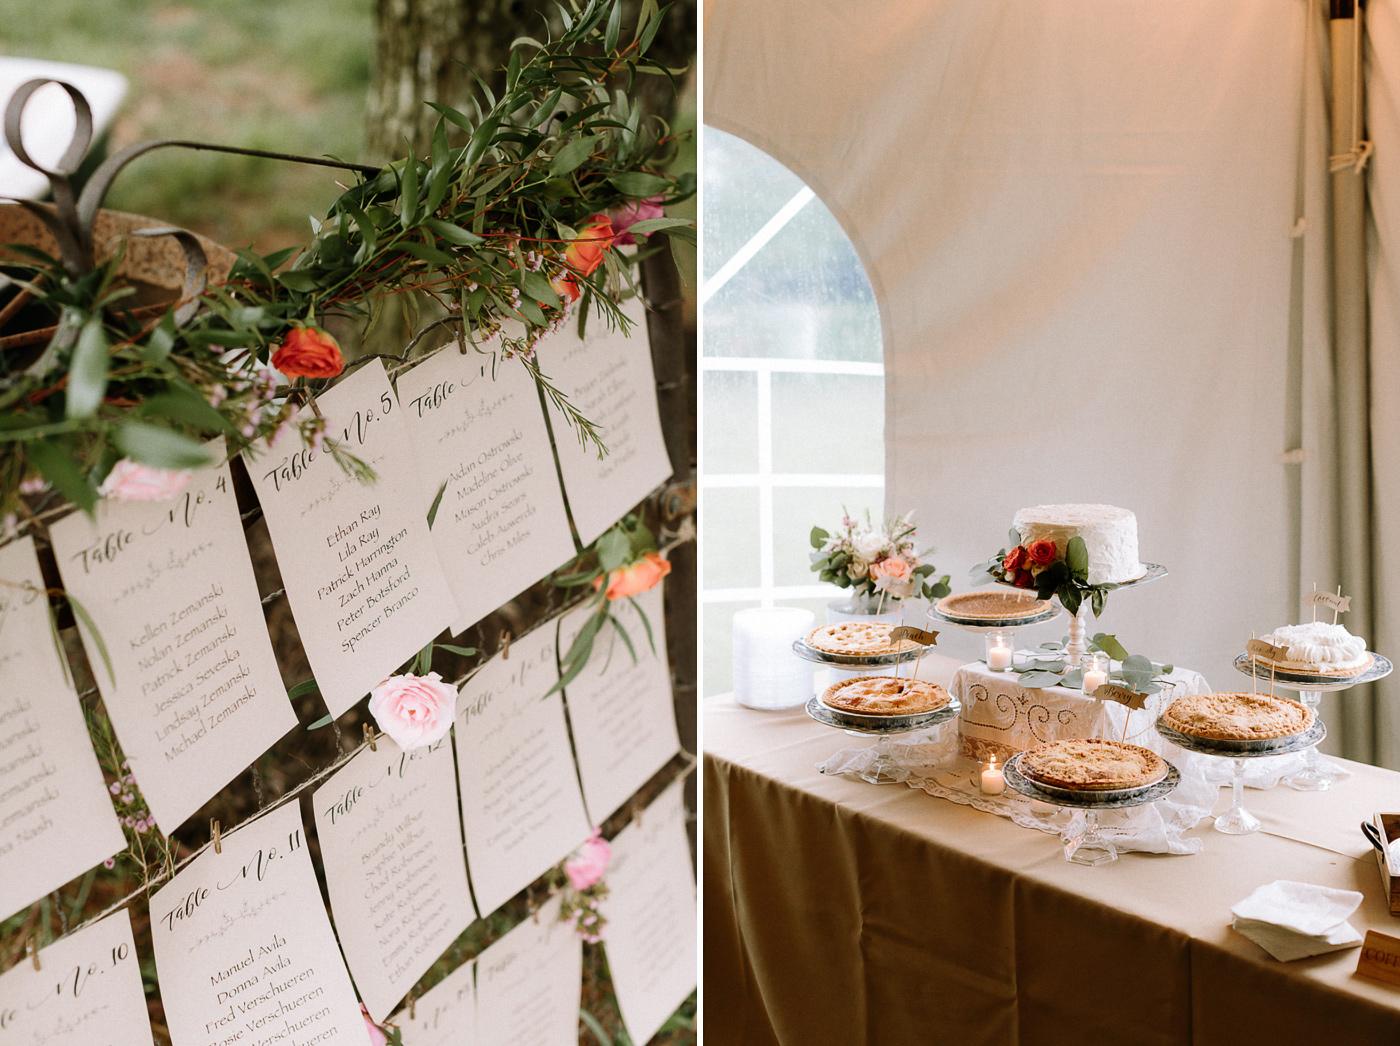 Seating chart wedding cake dessert pies